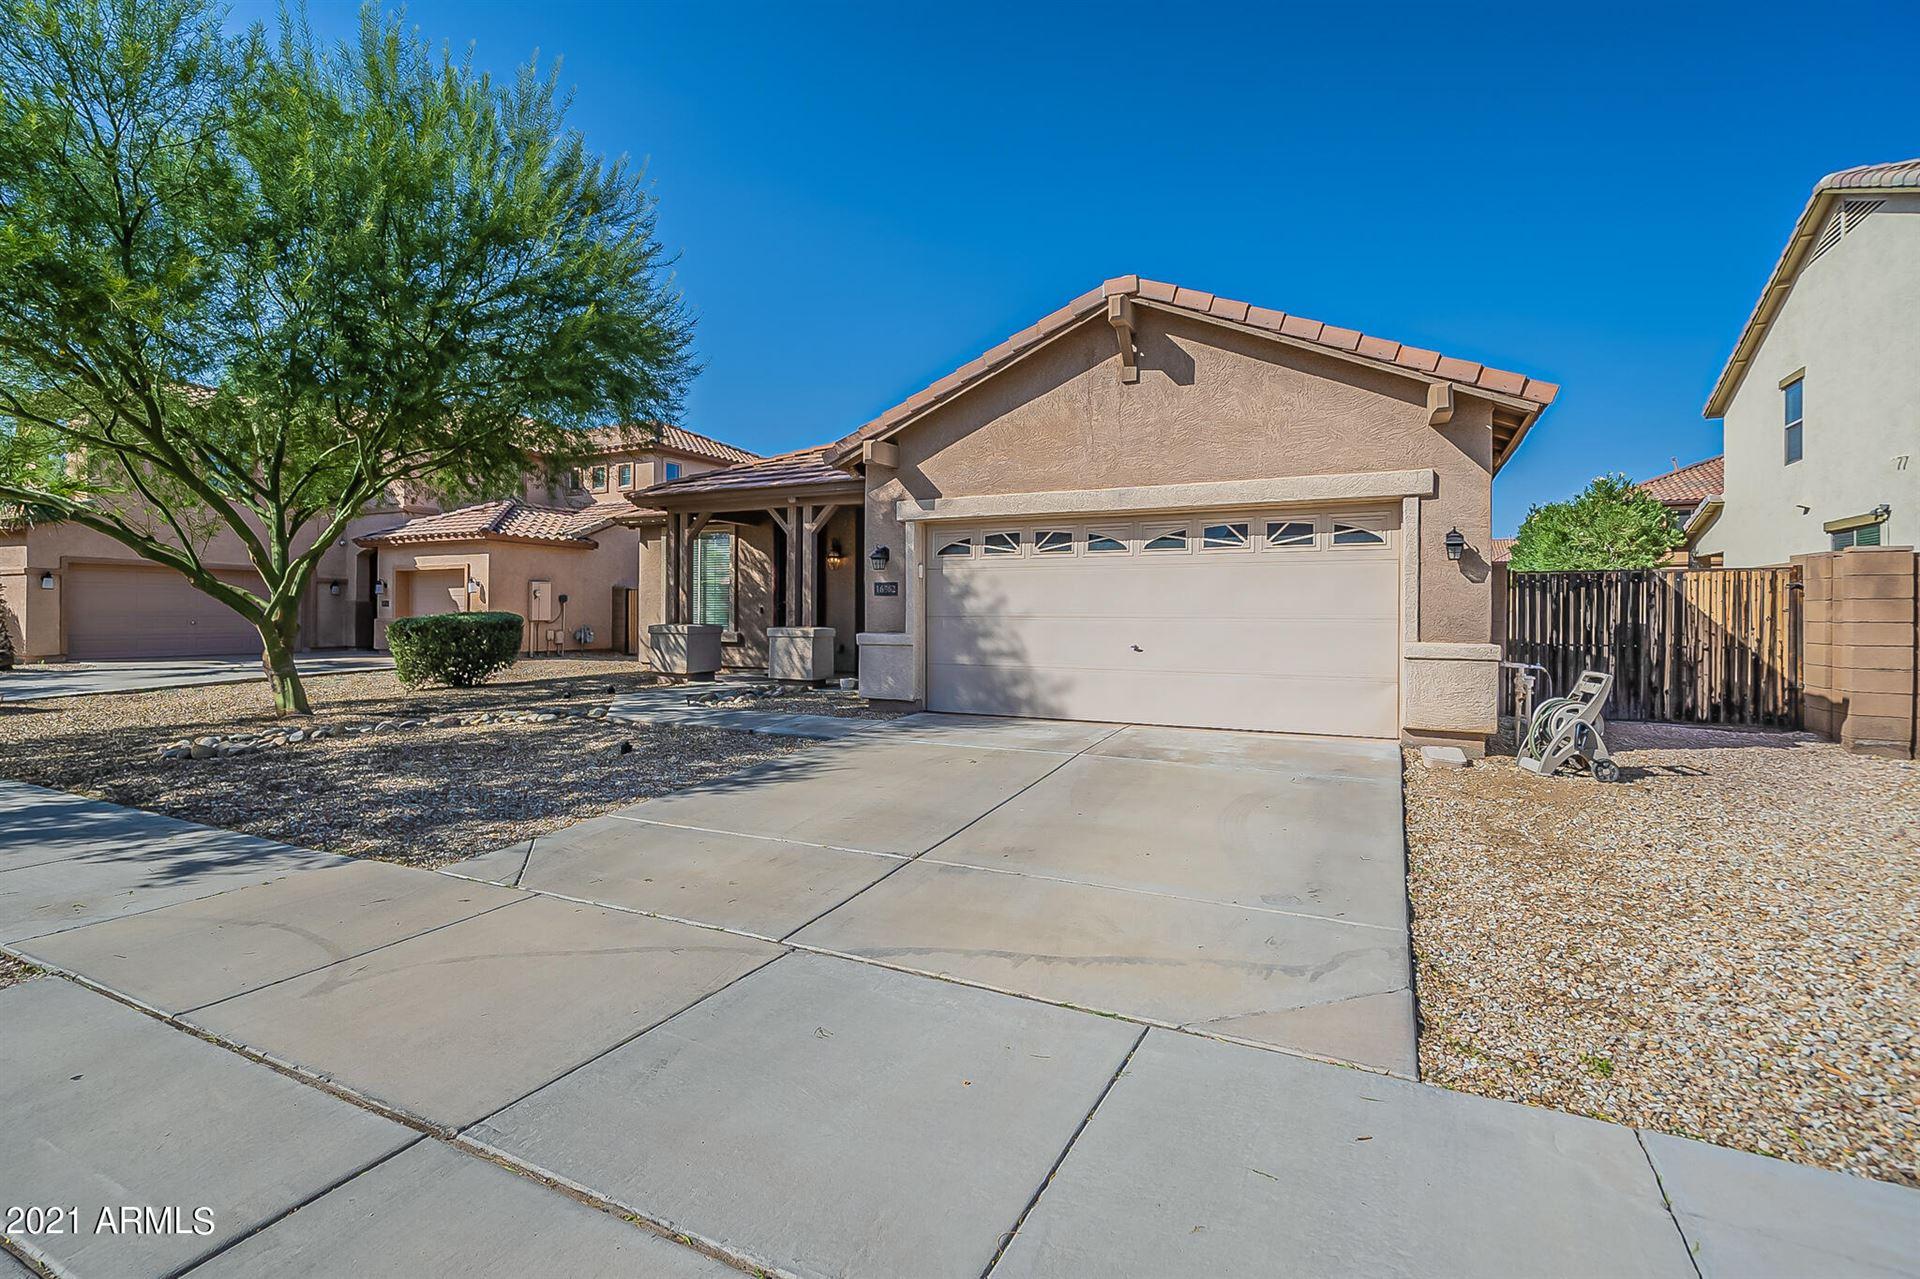 Photo of 16562 W HADLEY Street, Goodyear, AZ 85338 (MLS # 6307638)